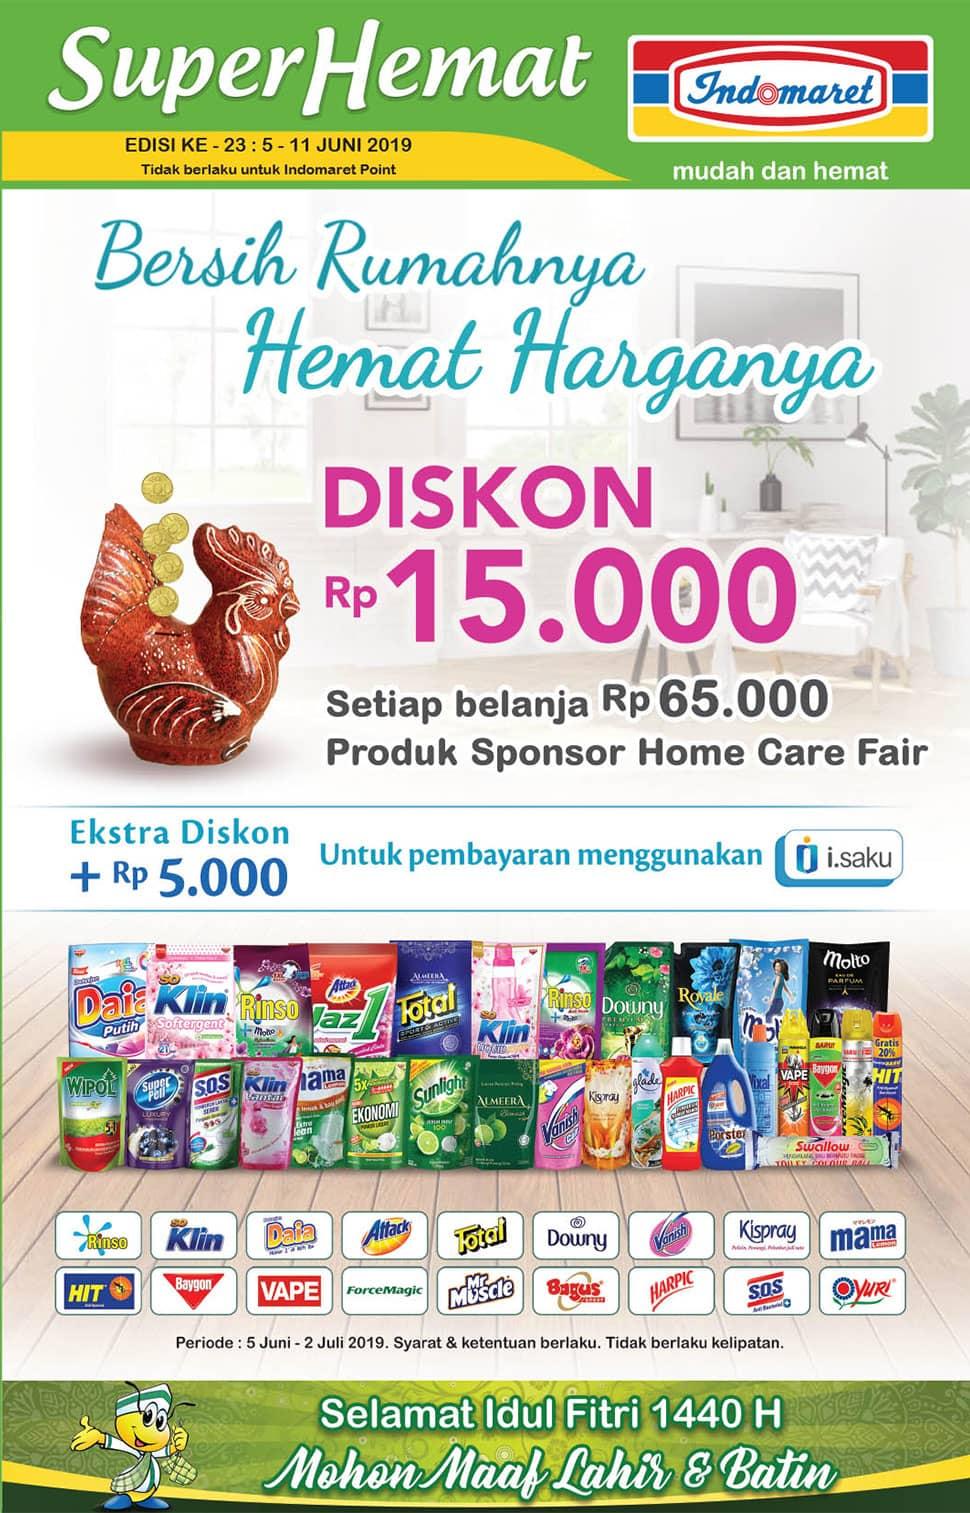 Diskon Promo INDOMARET Katalog Super Hemat periode 05-11 Juni 2019